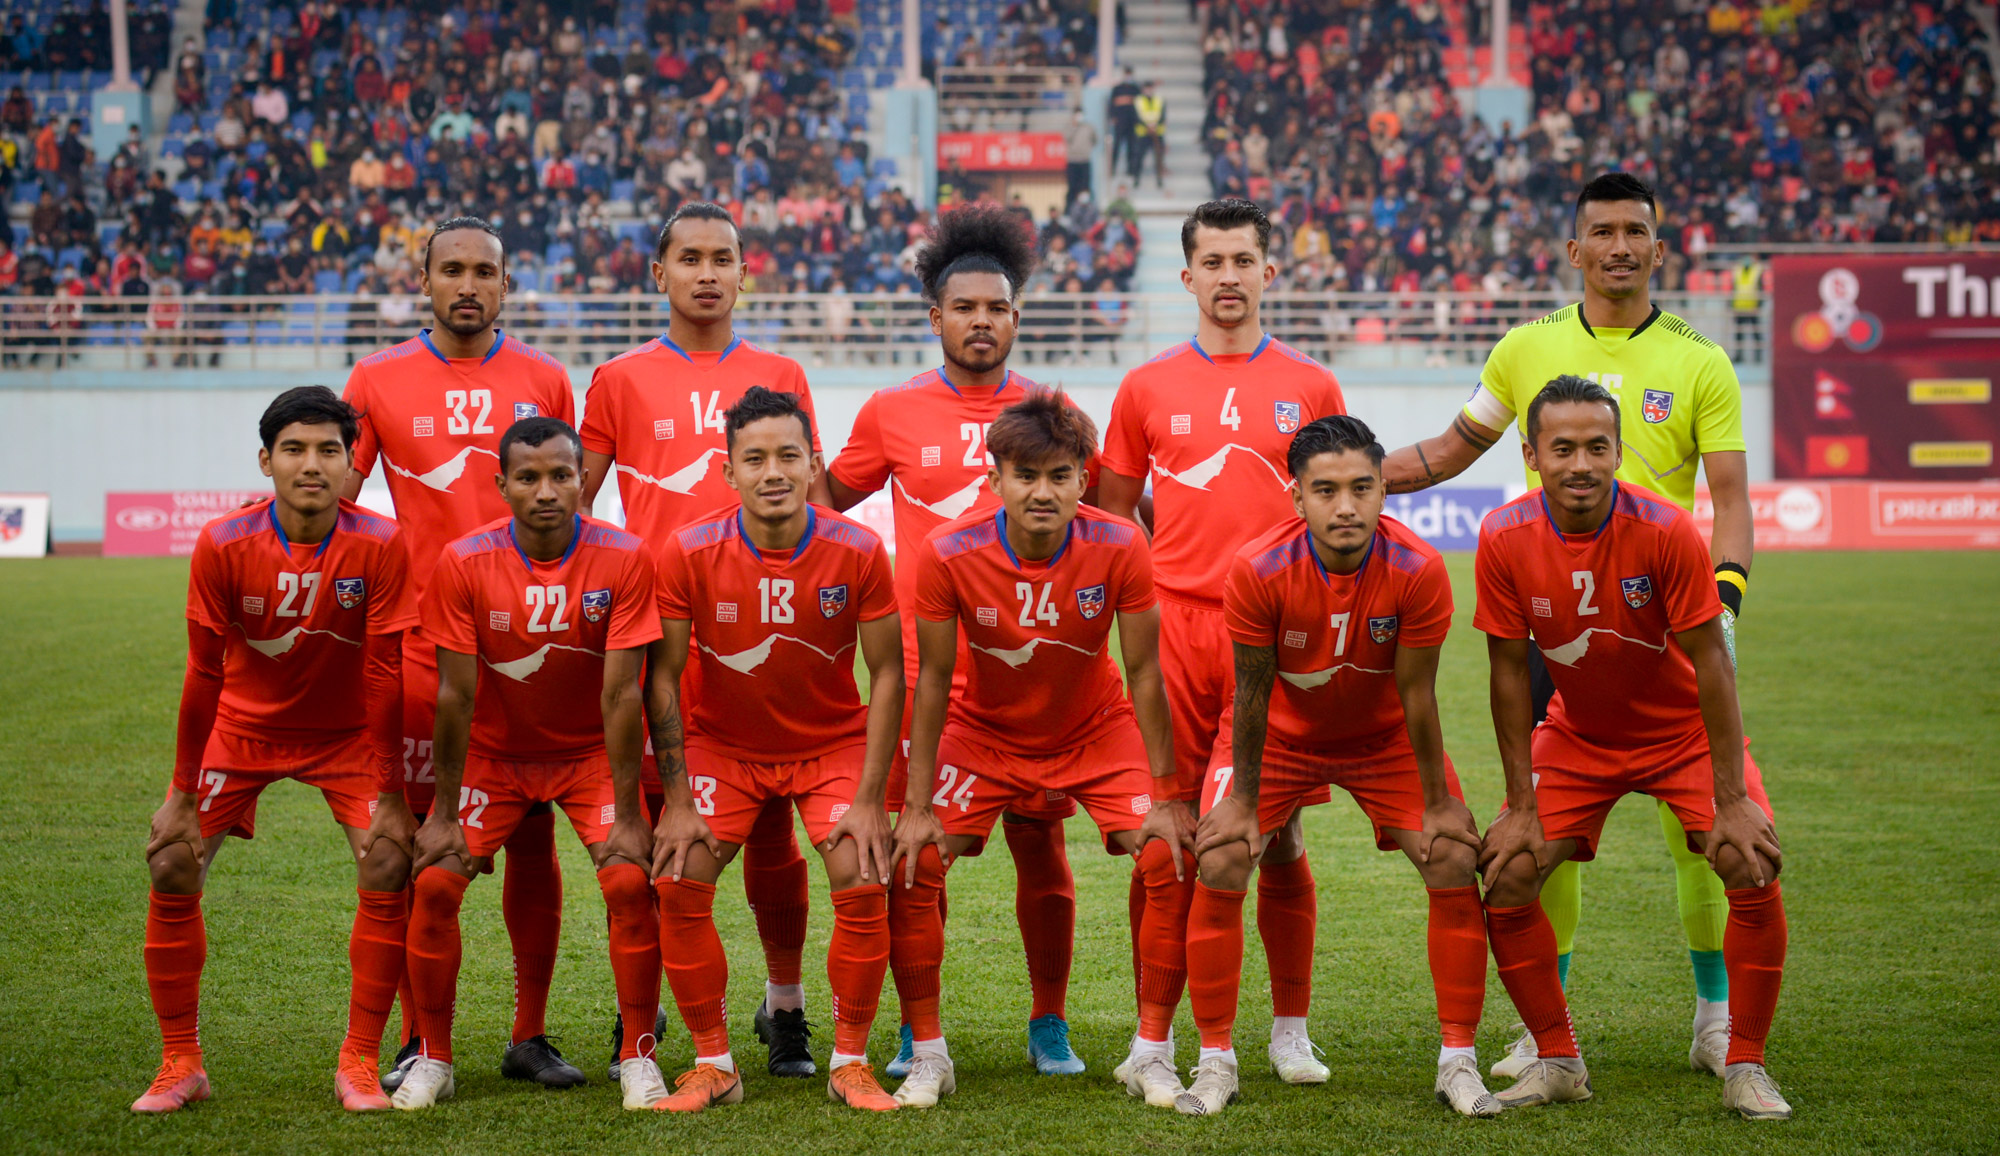 थ्री नेसन्स कप फाइनल: बंगलादेशविरुद्ध नेपाली टोलीमा दुई परिवर्तन